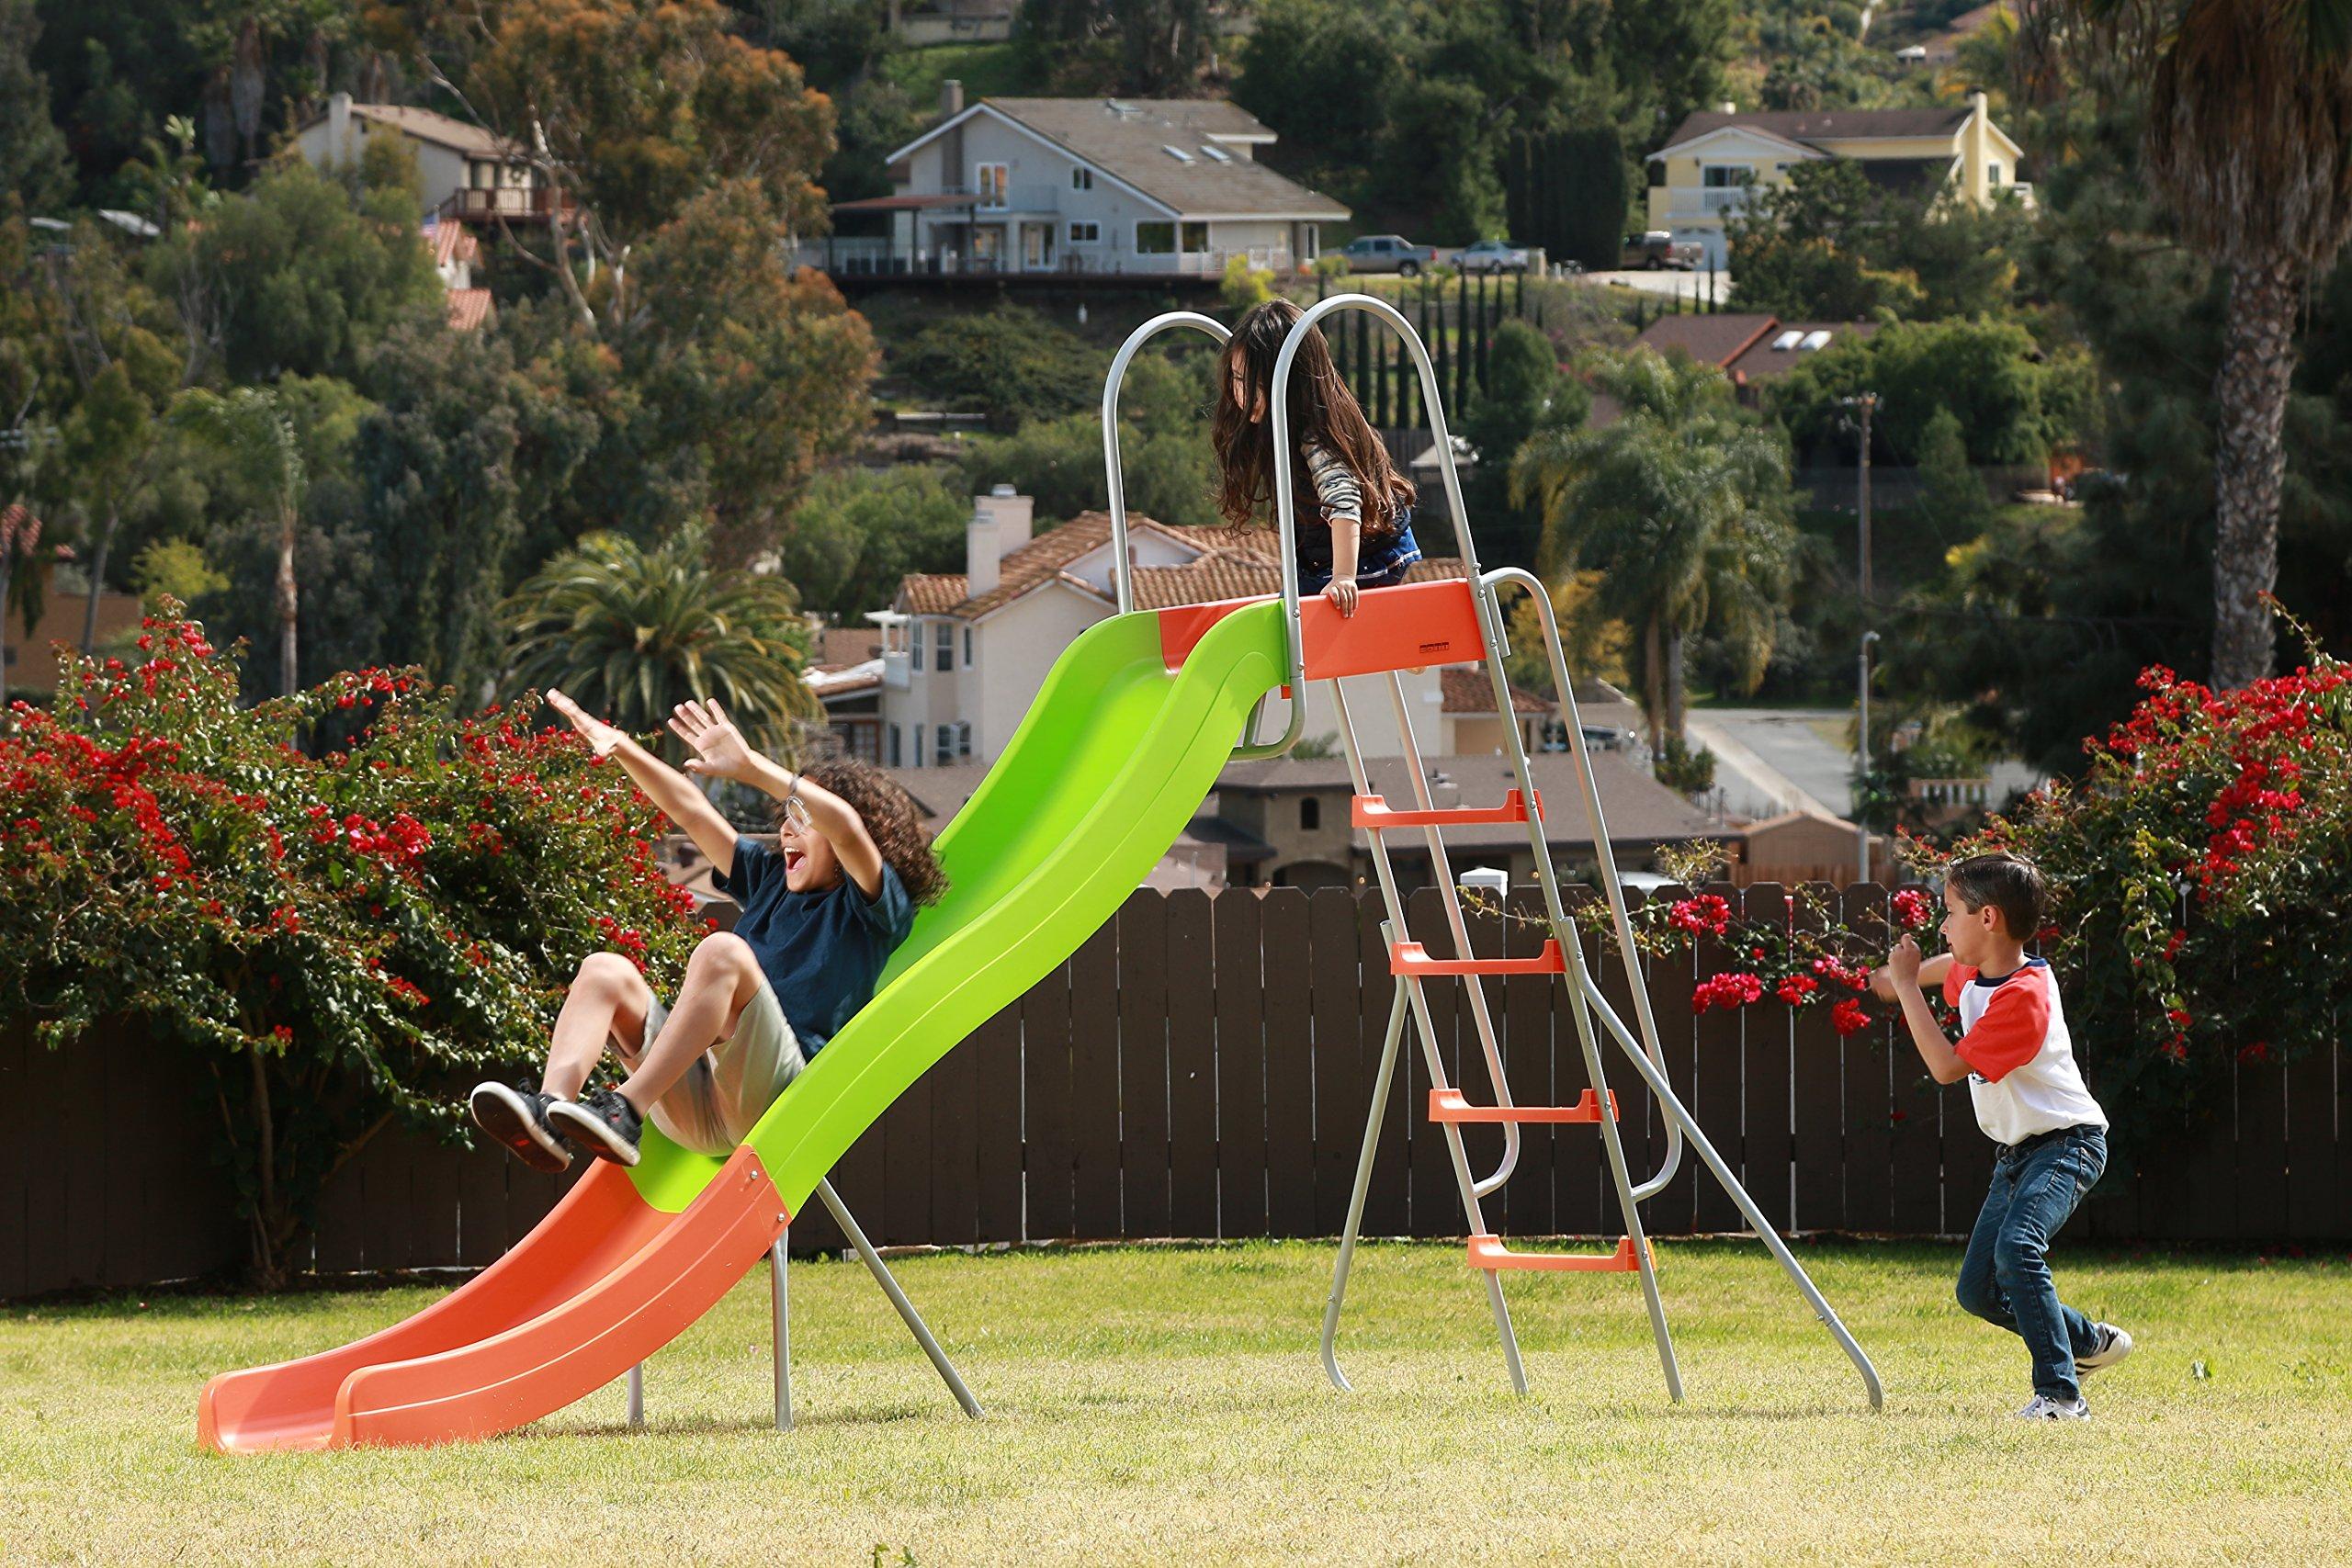 SLIDEWHIZZER Outdoor Play Set Kids Slide: 10 ft Freestanding Climber, Swingsets, Playground Jungle Gyms Kids Love - Above Ground Pool Slide for Summer Backyard by SLIDEWHIZZER (Image #6)